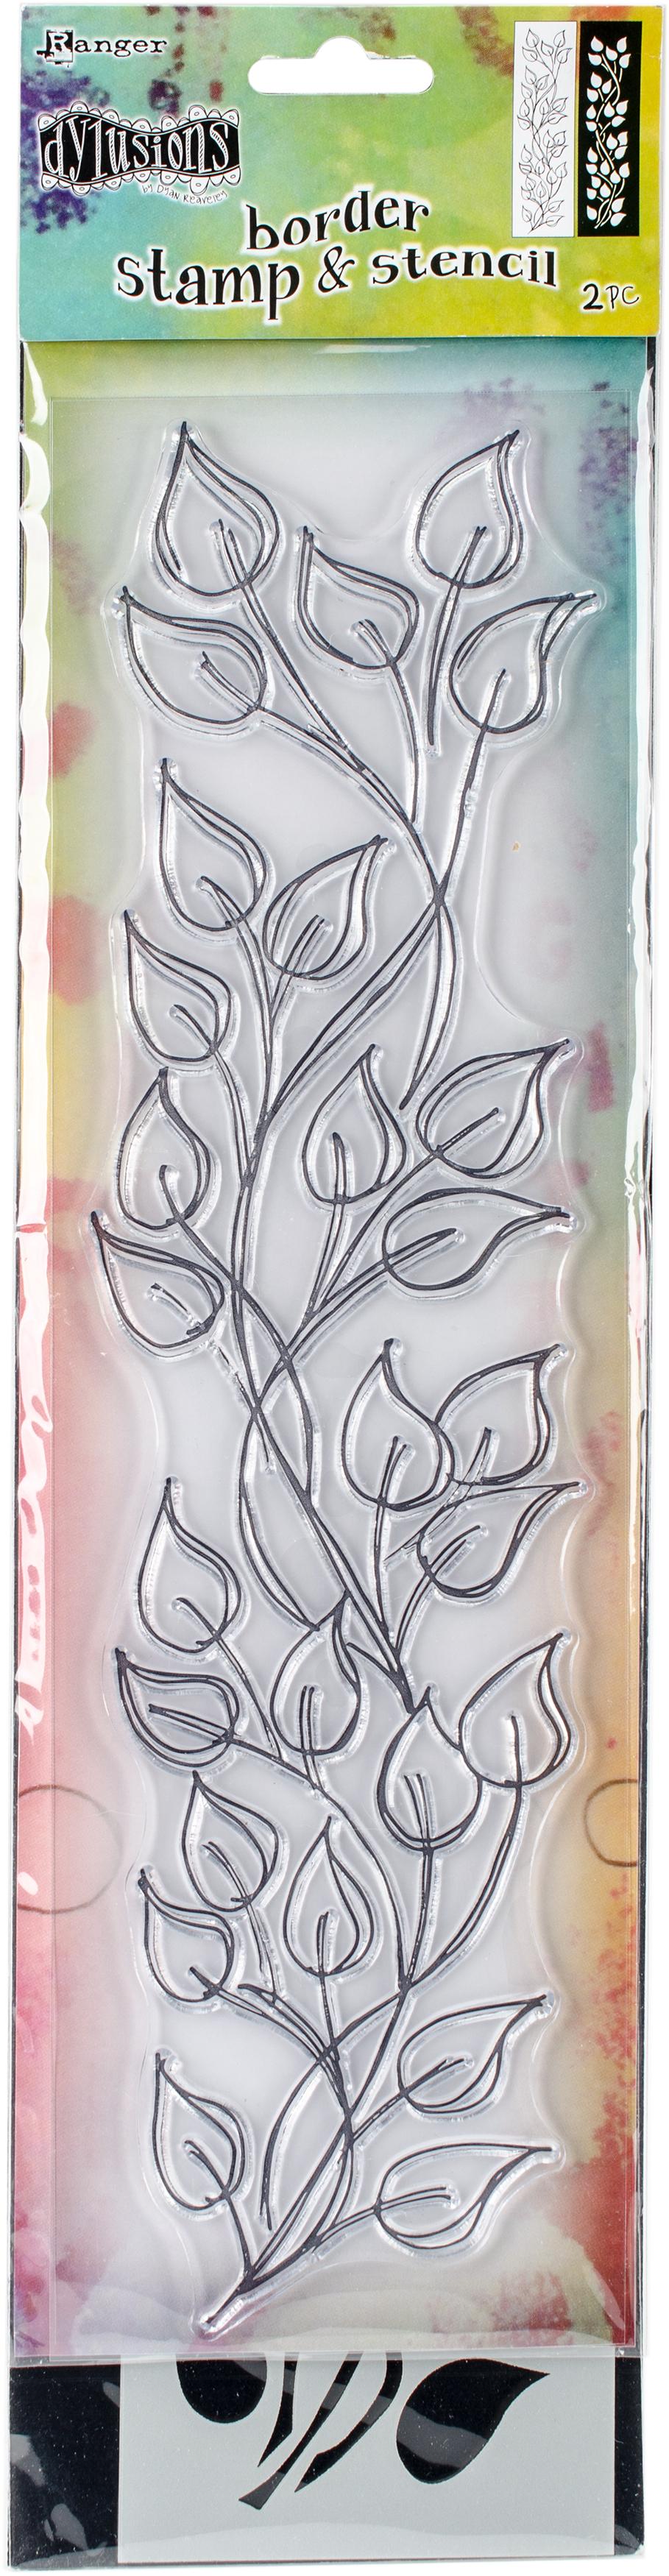 Dyan Reaveley's Dylusions Clear Stamp & Stencil Set 12-Leaf